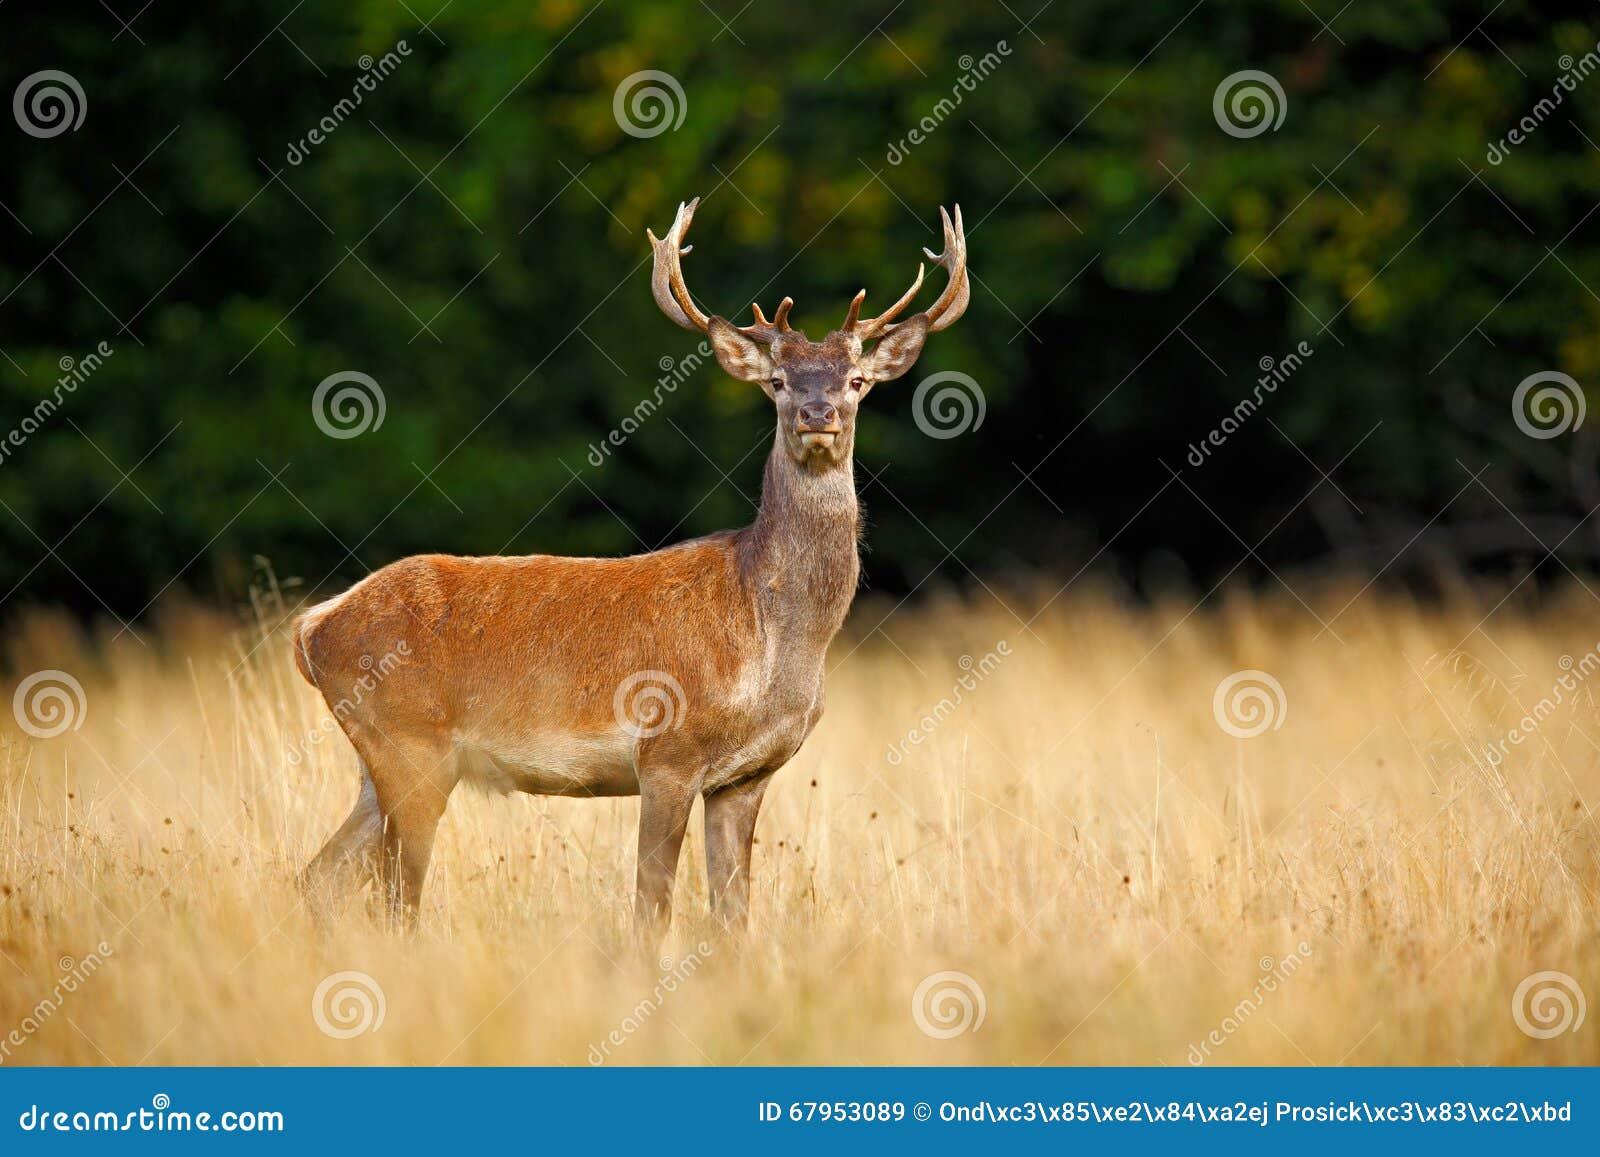 adult parties in red deer